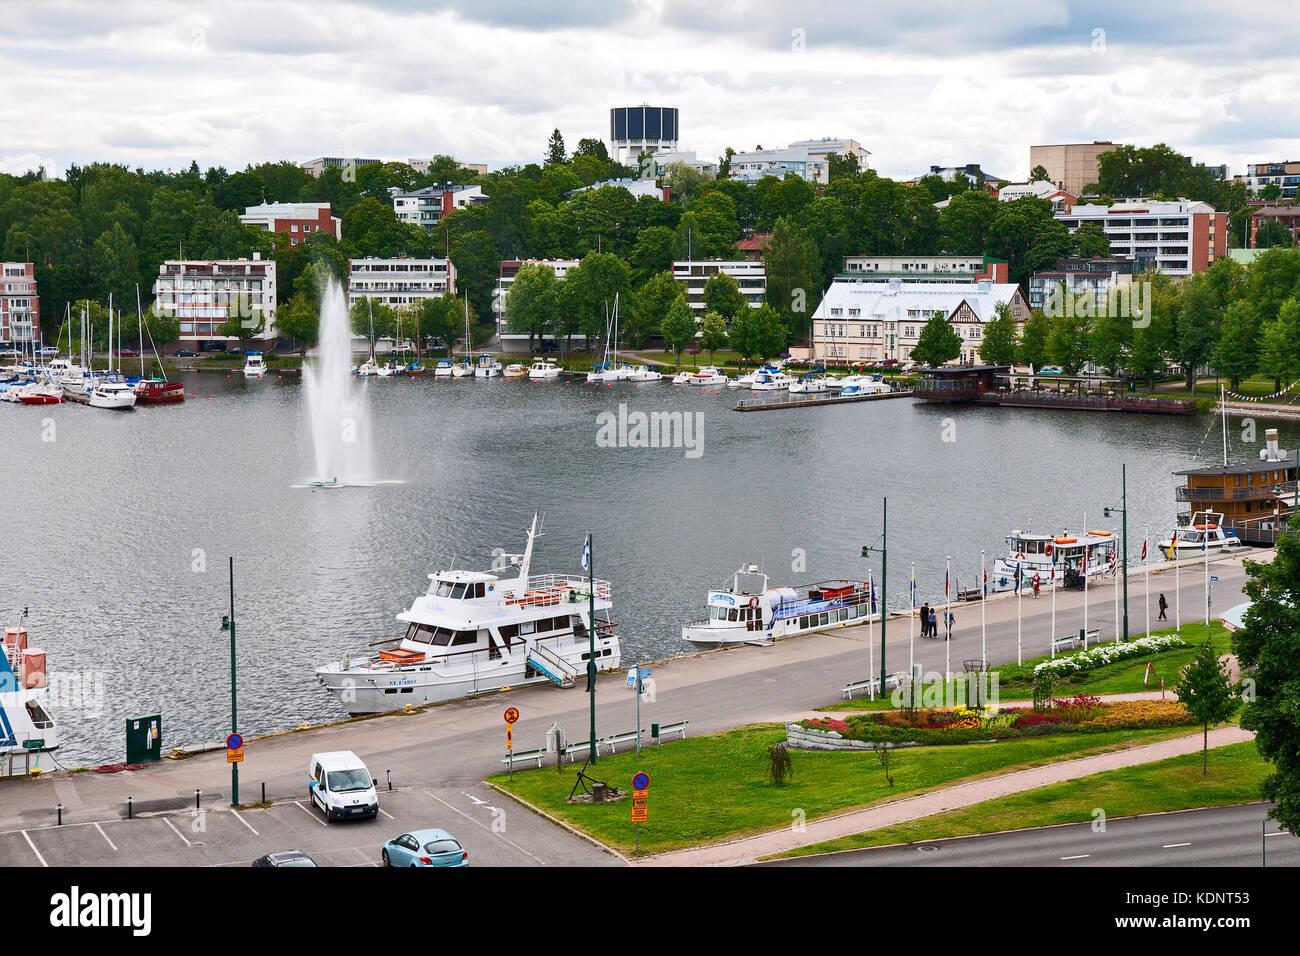 LAPPEENRANTA, FINLAND - JULY 21, 2013 - Pleasure boats are at the pier of the port Lappeenranta Stock Photo